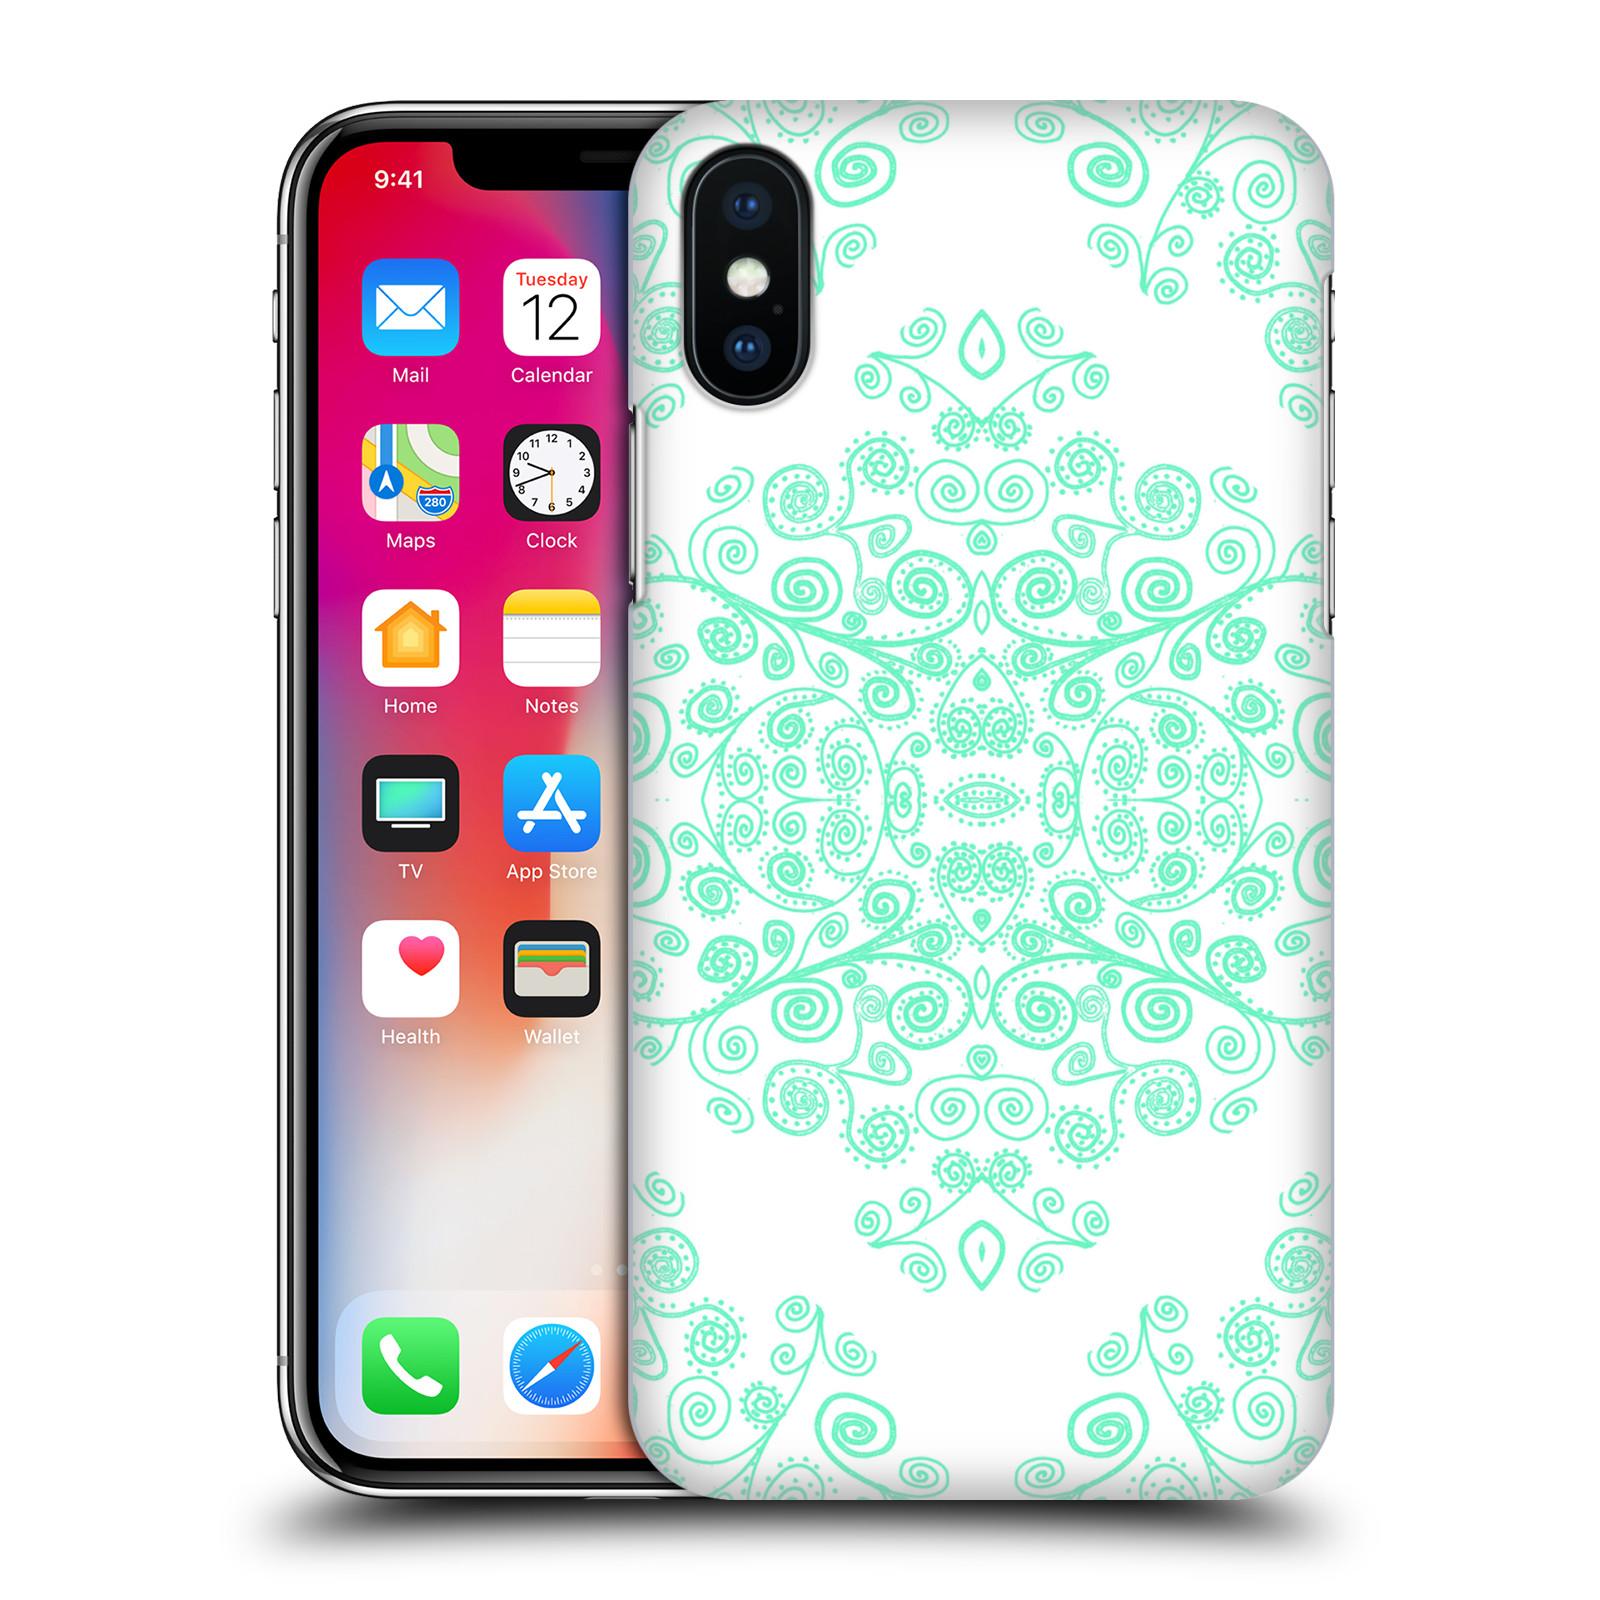 OFFICIAL-MONIKA-STRIGEL-AMBROSIA-HARD-BACK-CASE-FOR-APPLE-iPHONE-PHONES